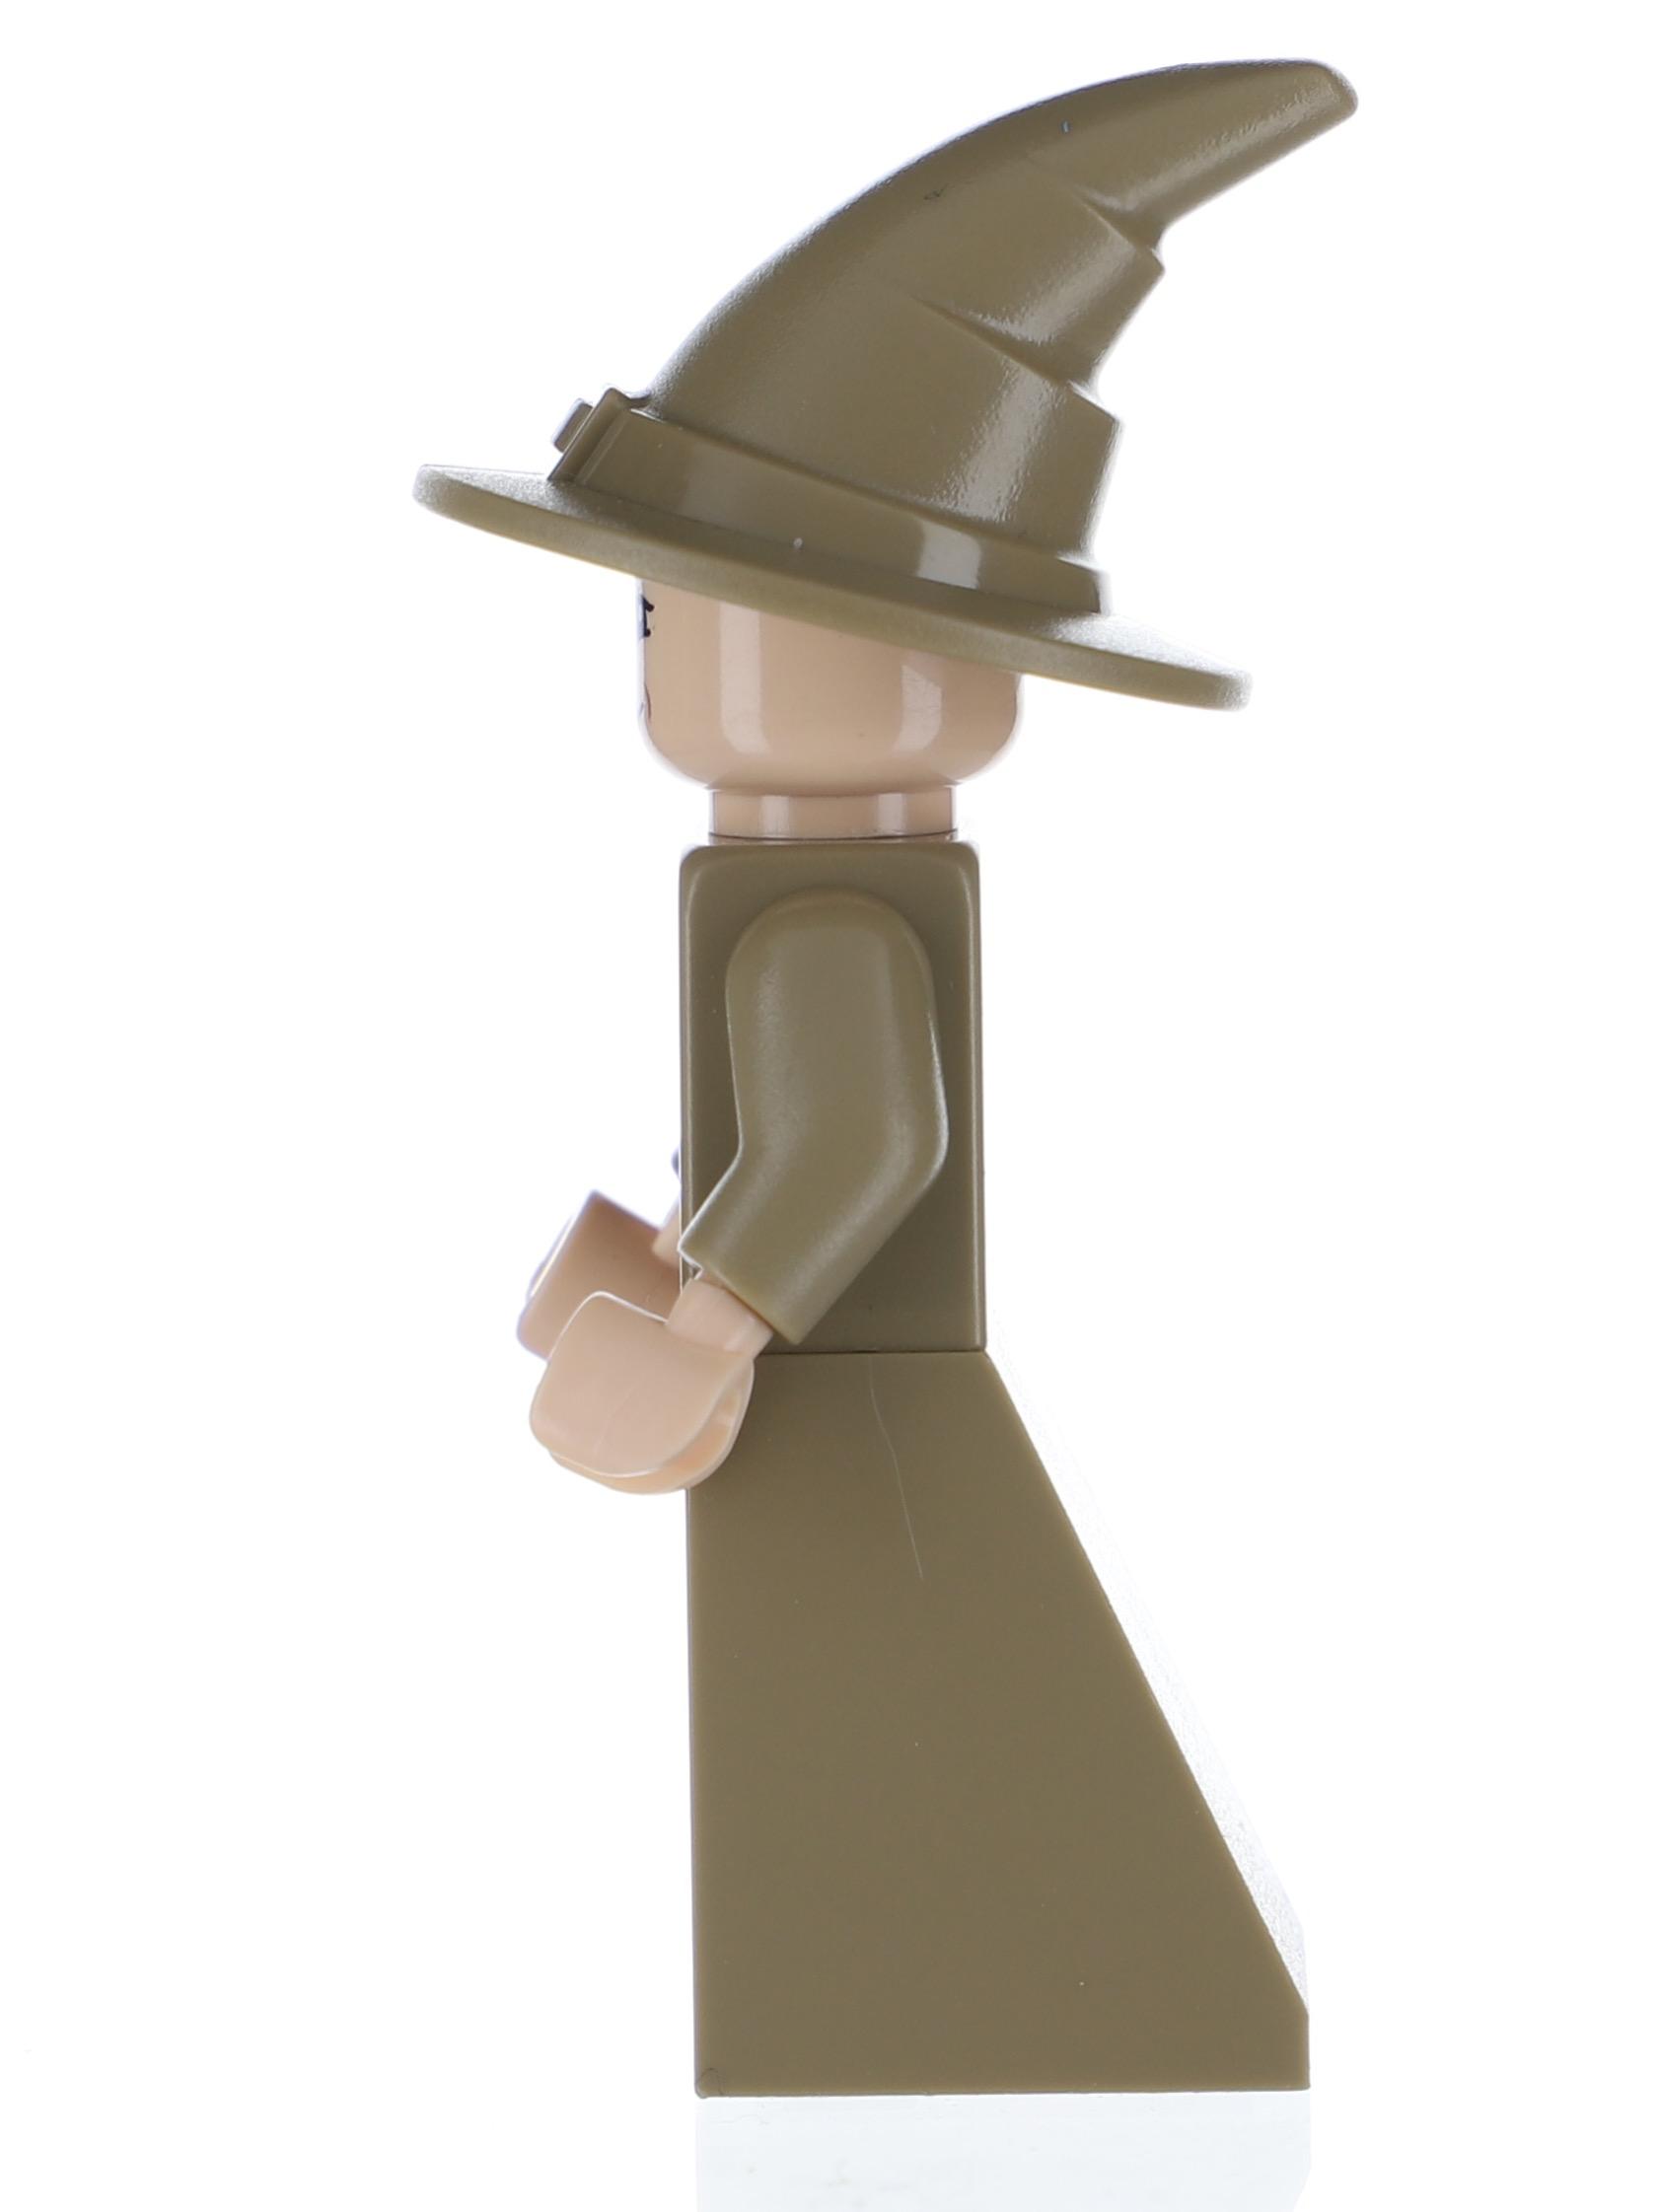 Lego Harry Potter Minifigura Serie 2-el profesor Pomona Sprout colhp 37